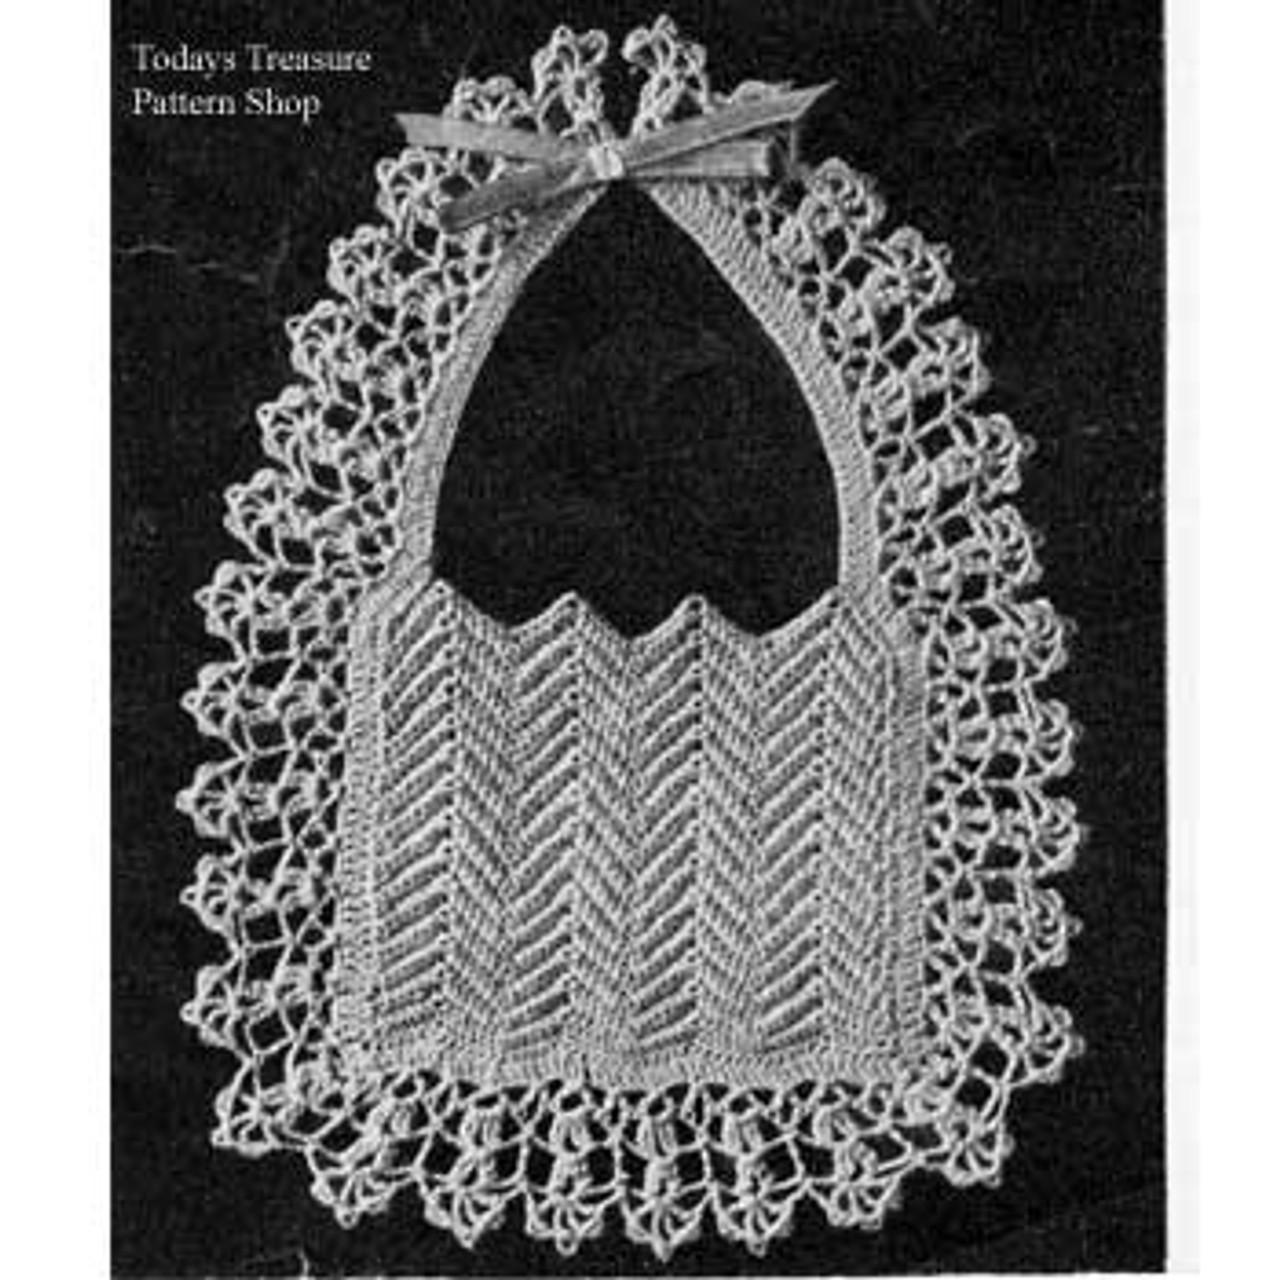 Frilly Lace Baby Bib Crochet Pattern